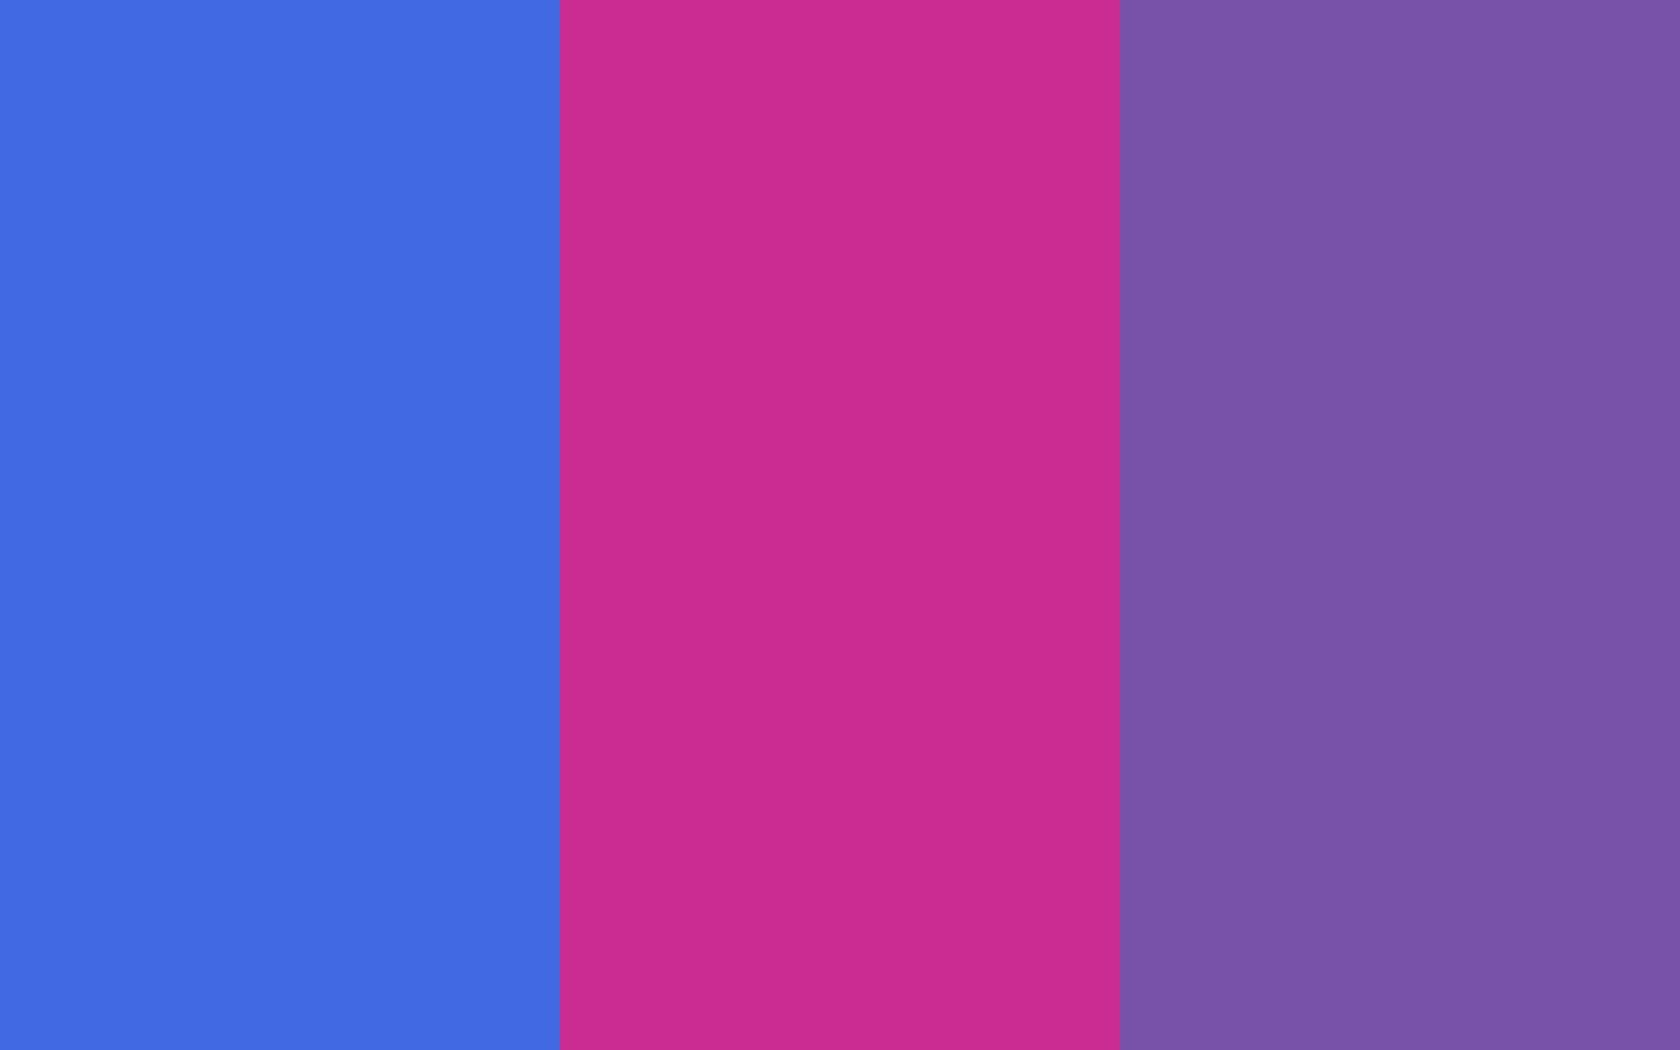 Royal purple backgrounds